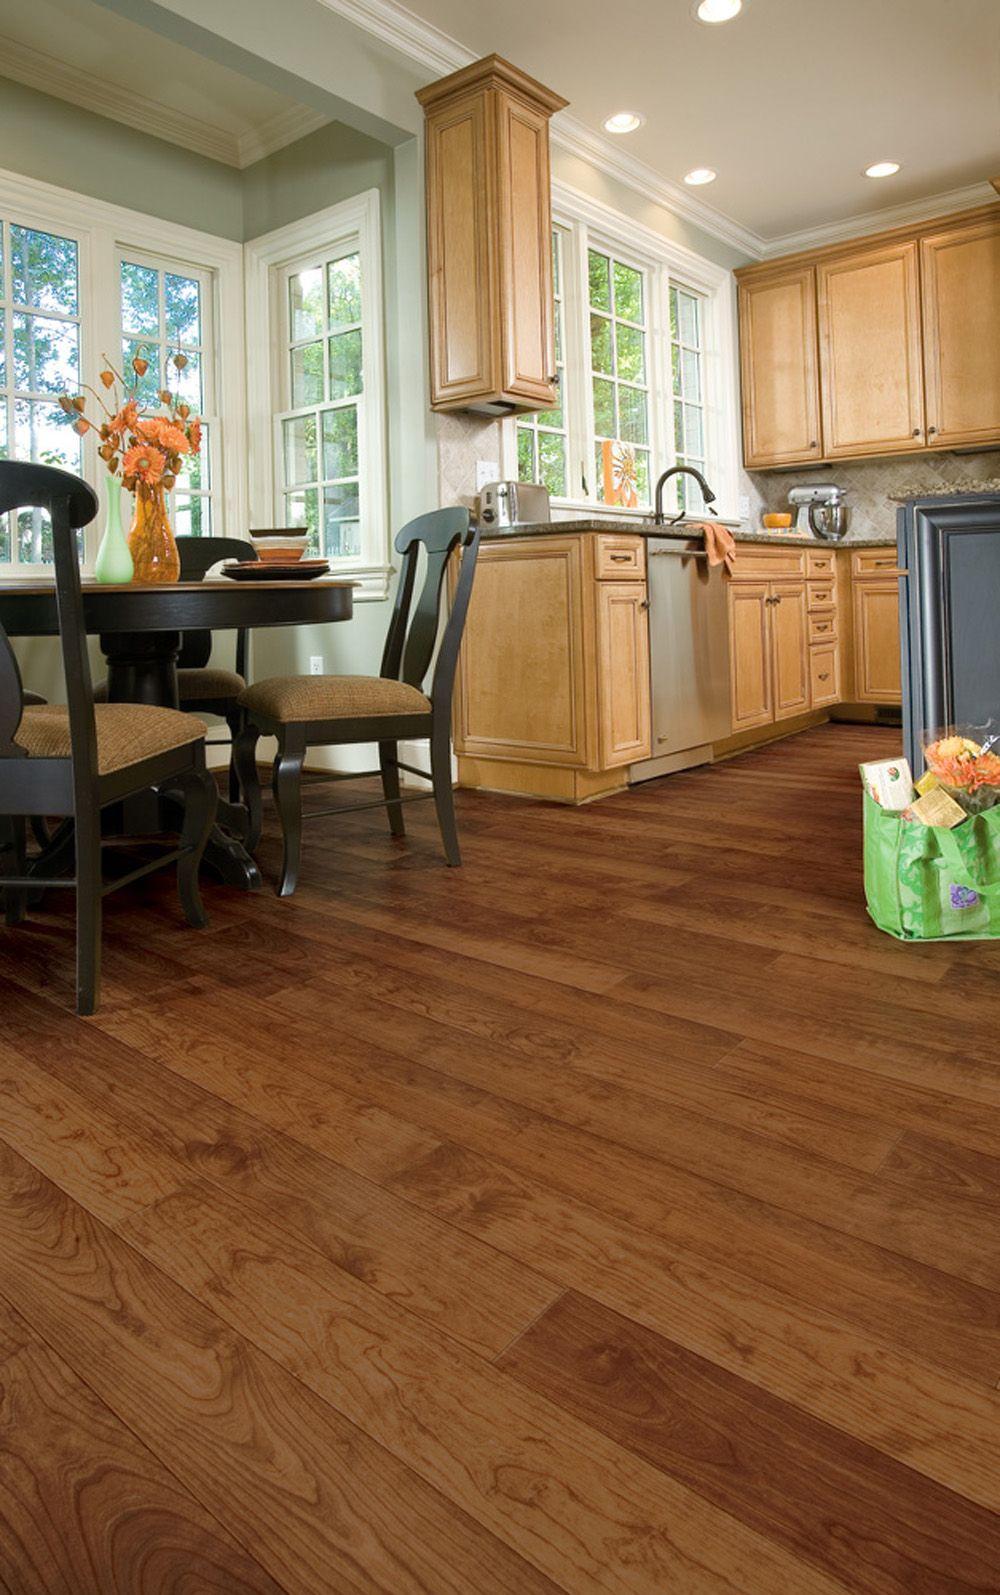 Luxe Vinyl Plank Coles Fine Flooring Vinyl Plank Flooring Kitchen Vinyl Flooring Kitchen Armstrong Vinyl Flooring